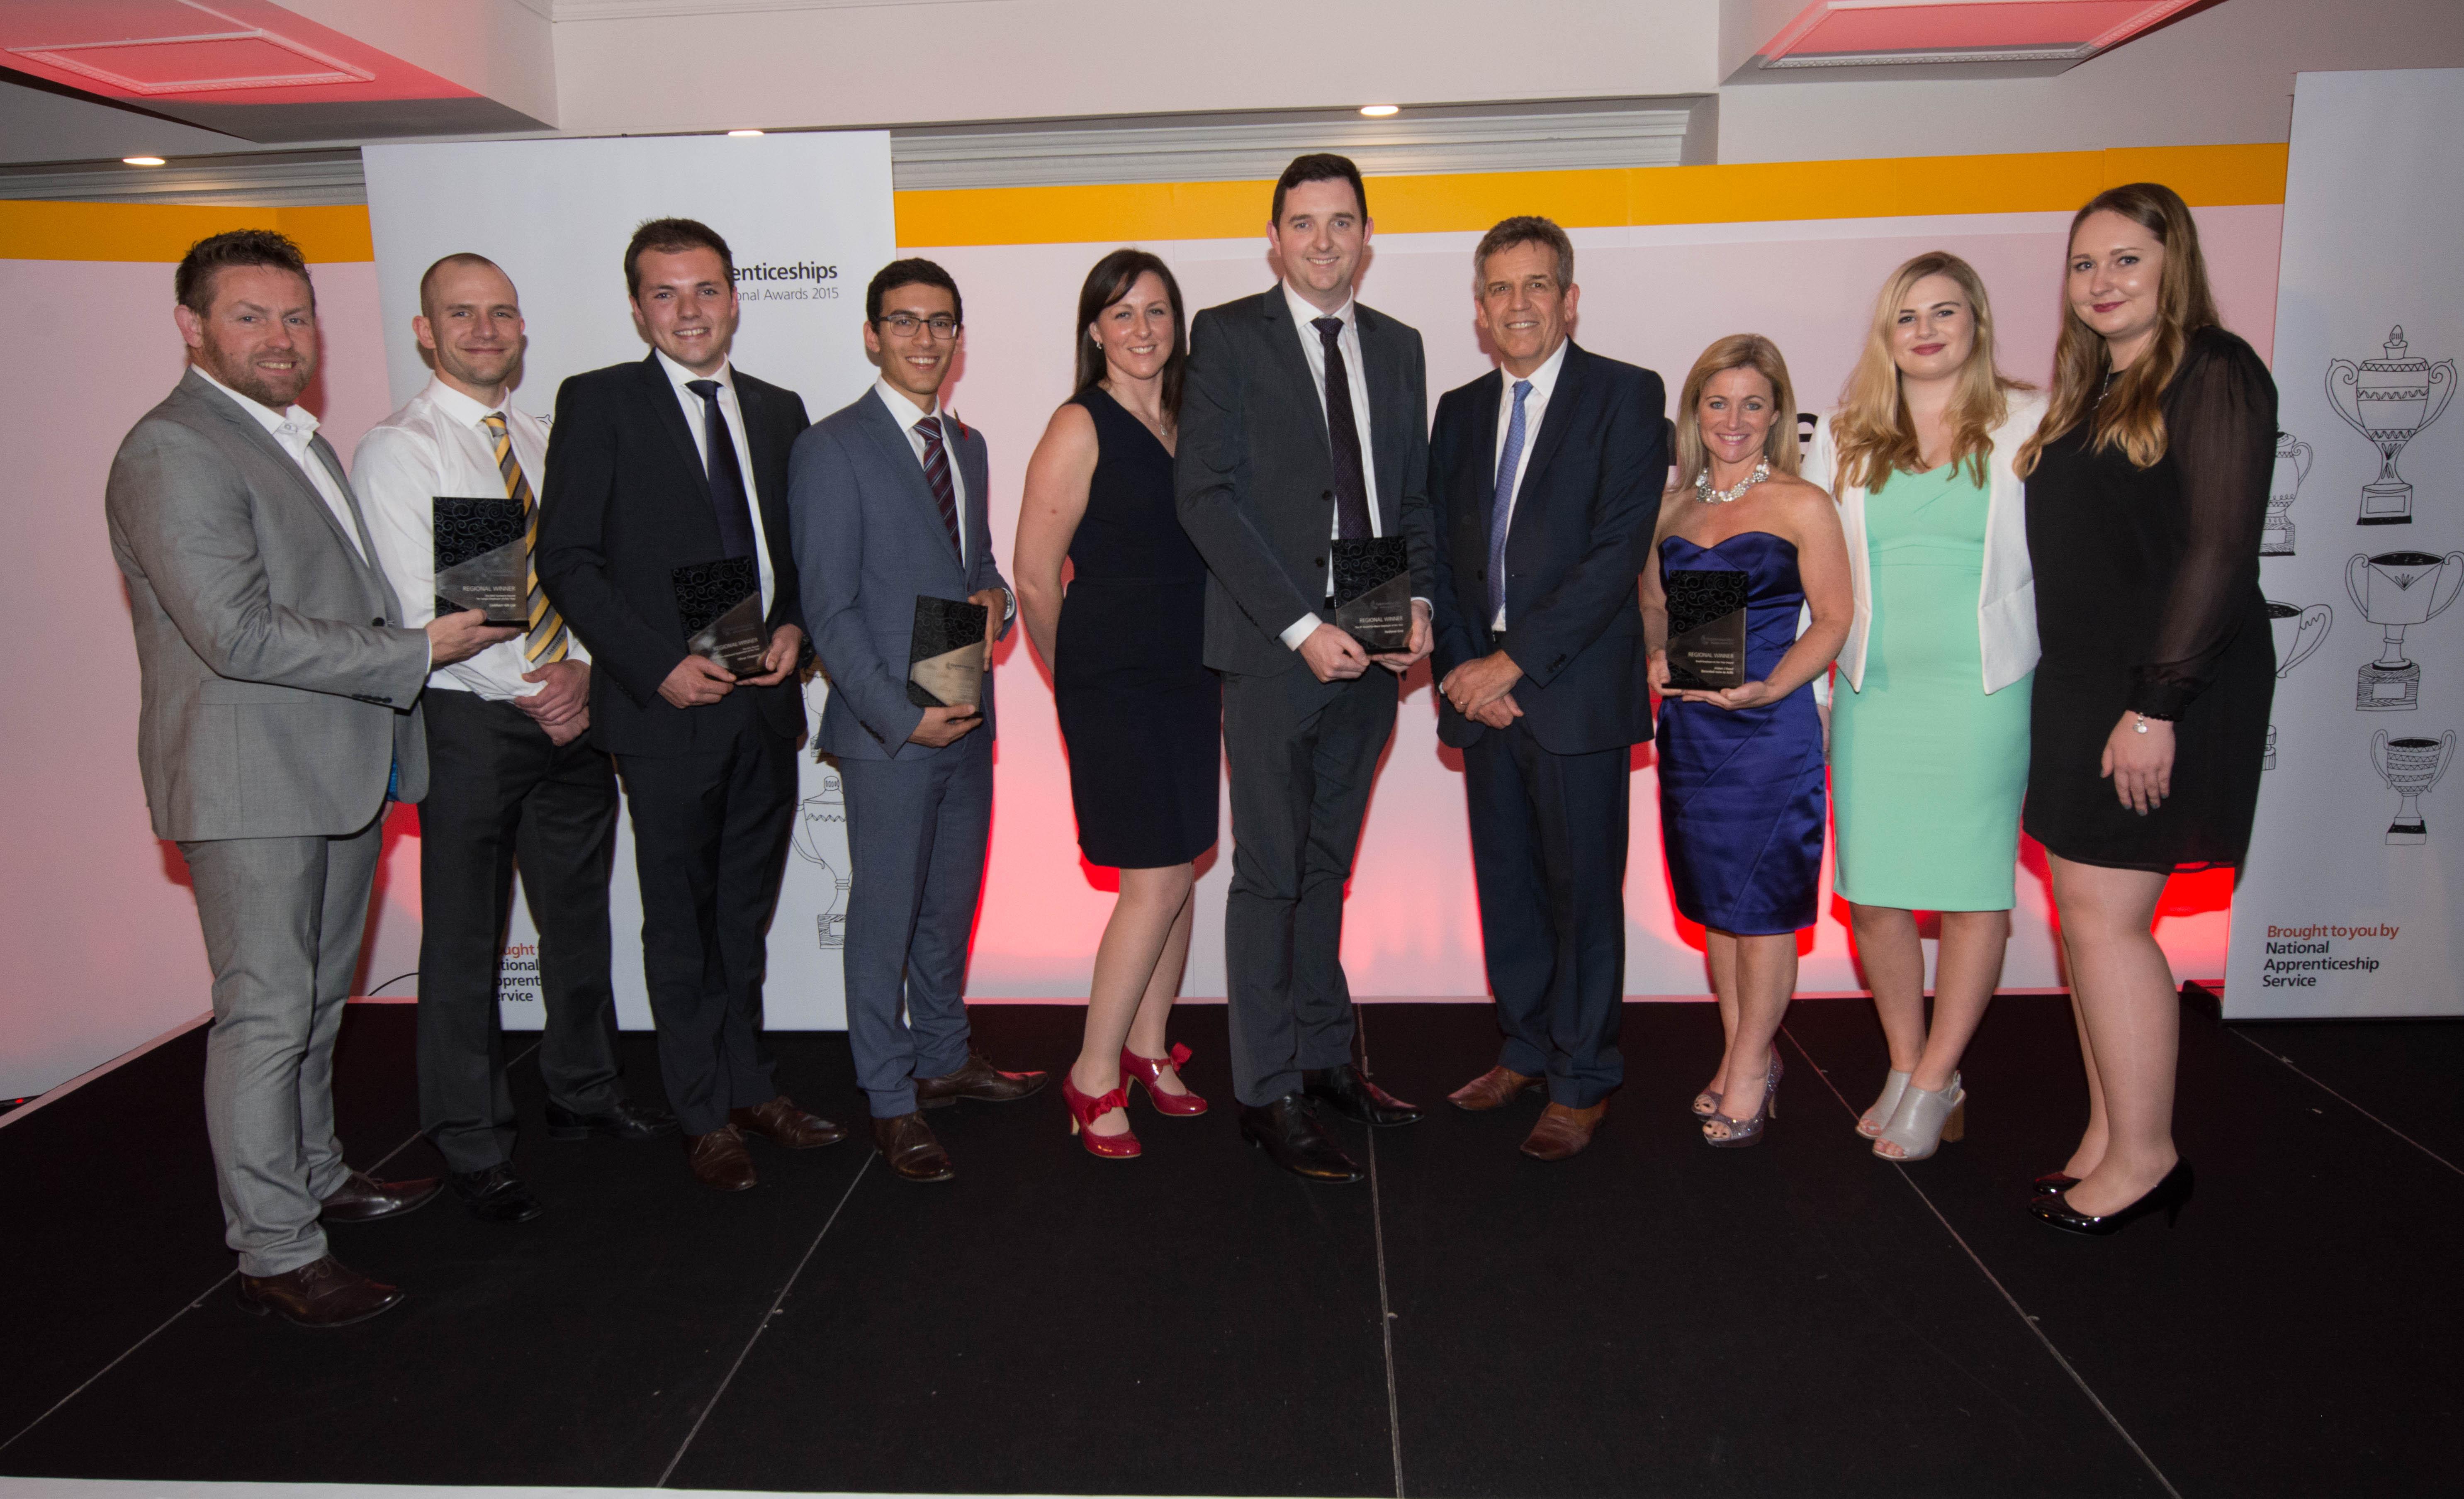 The East Midlands regional winners